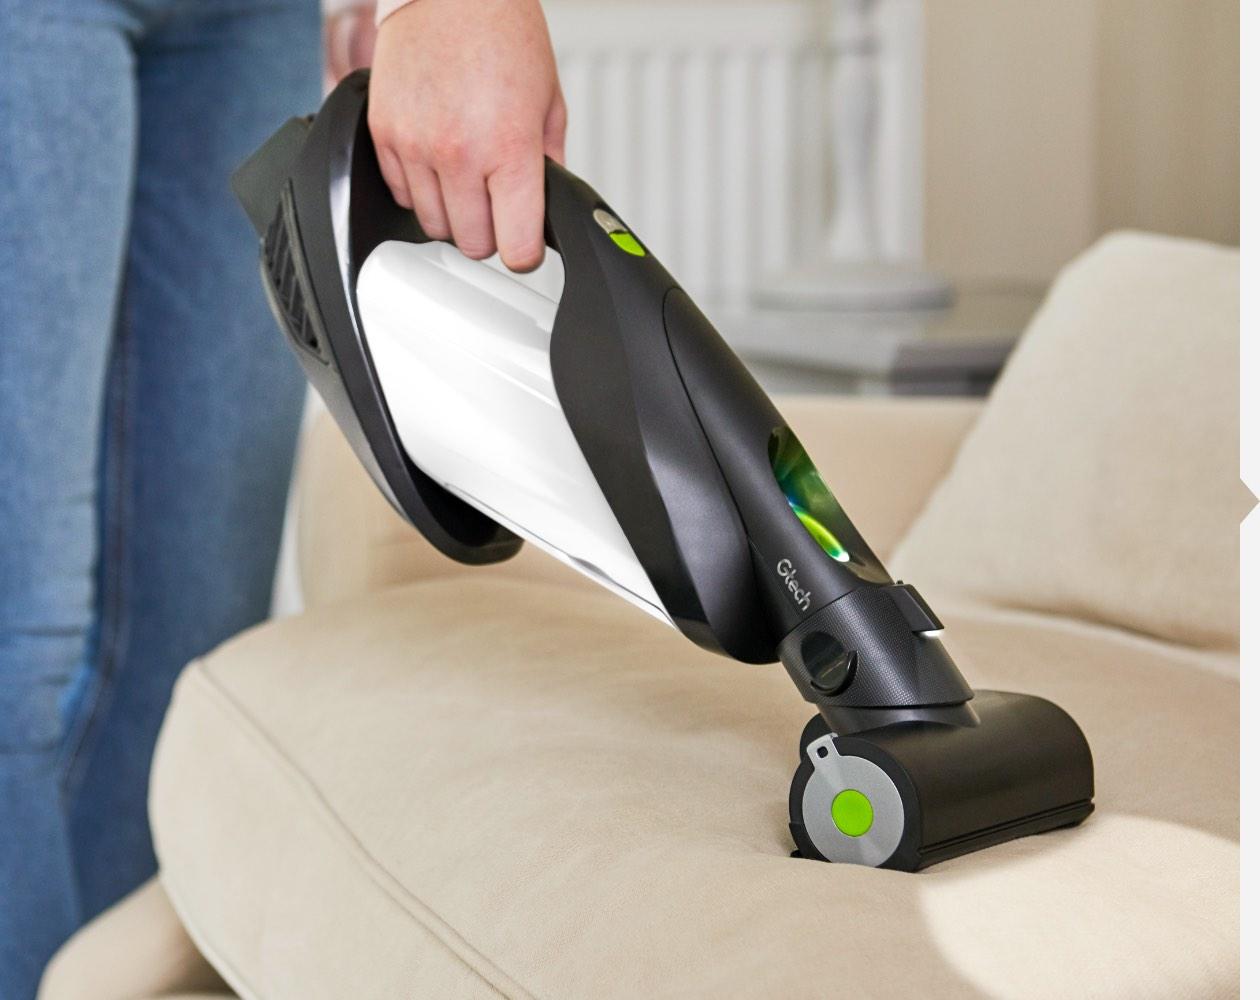 Woman using ProLite handheld vacuum with power head attachment to vacuum sofa